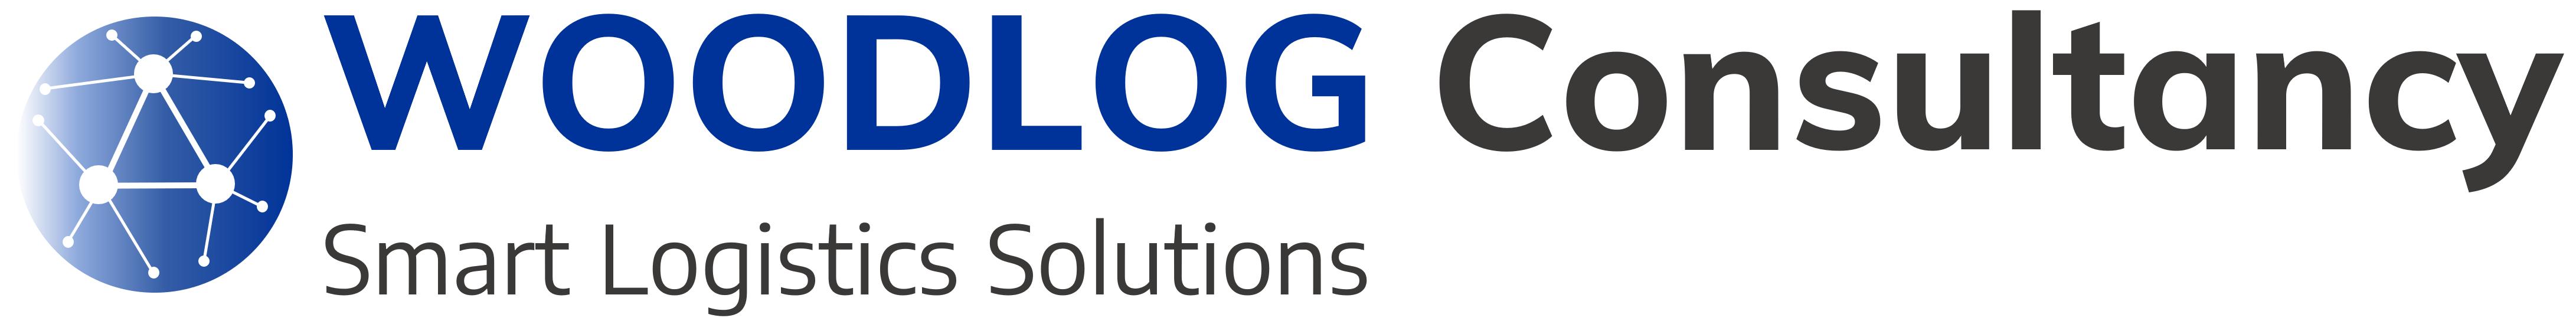 Woodlog Consultancy